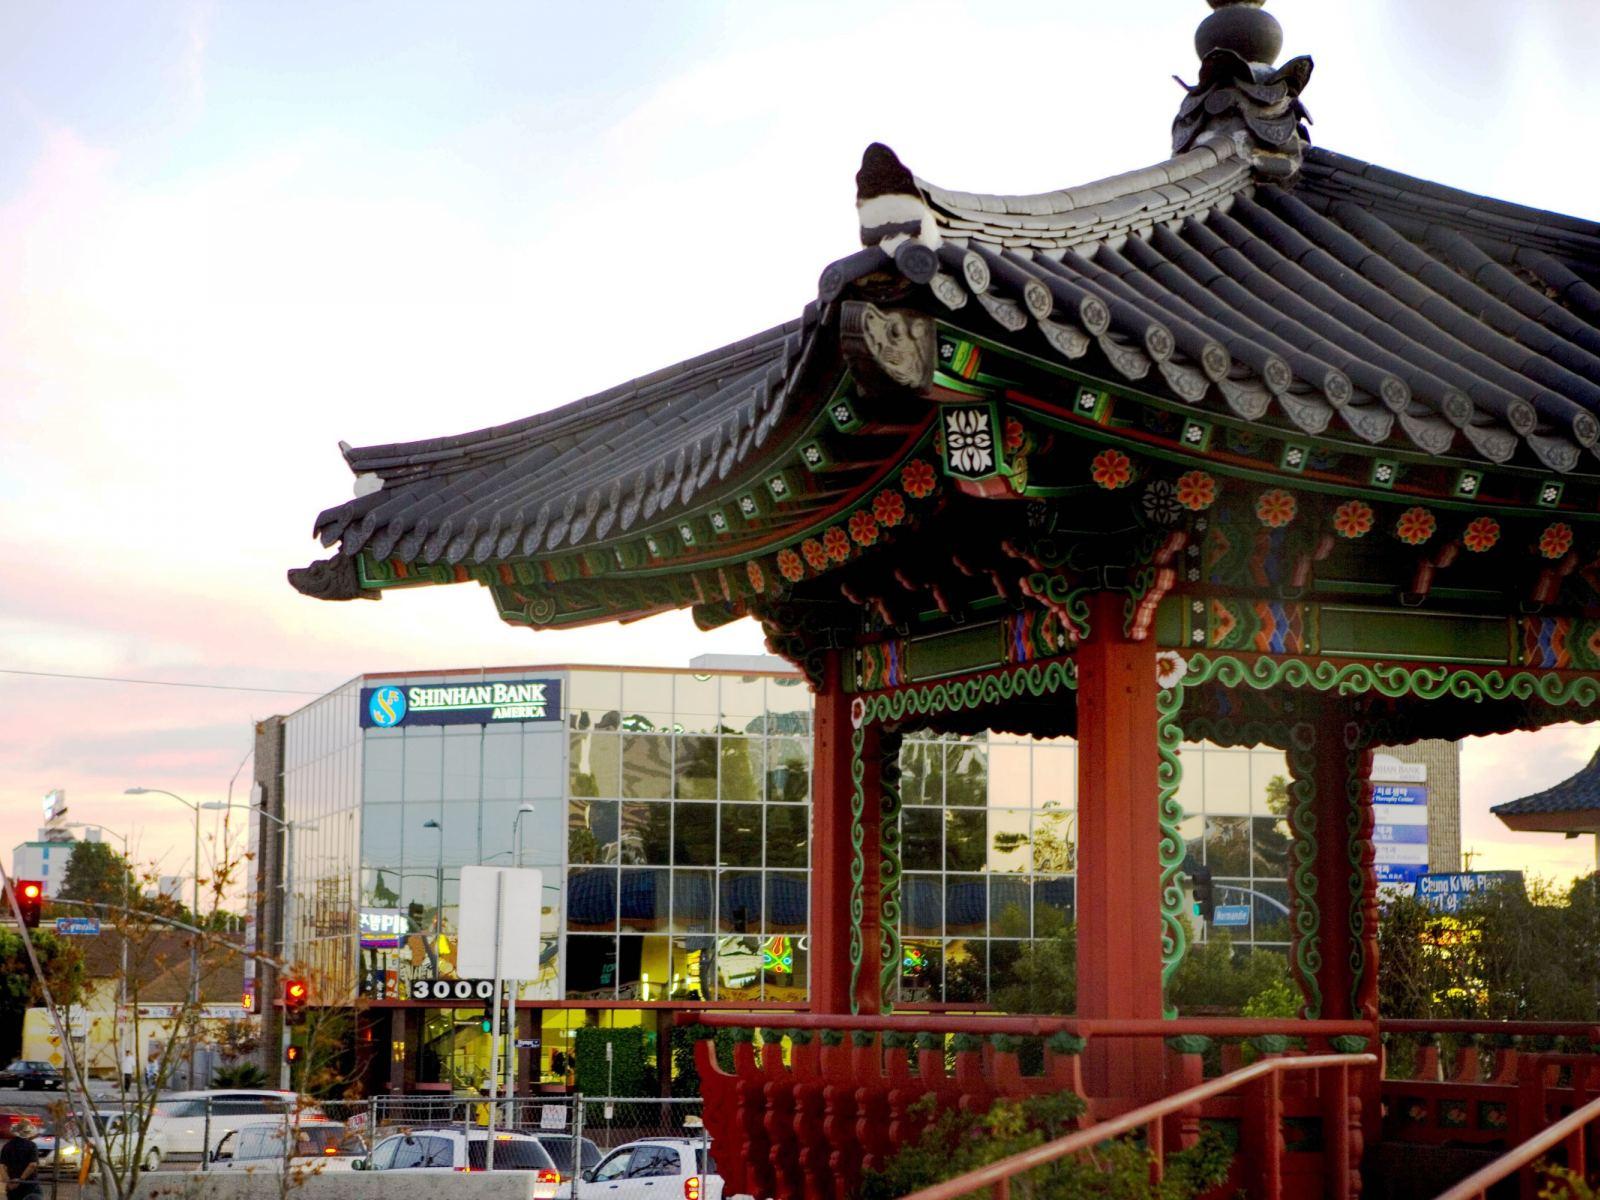 Koreatown Pavilion Garden